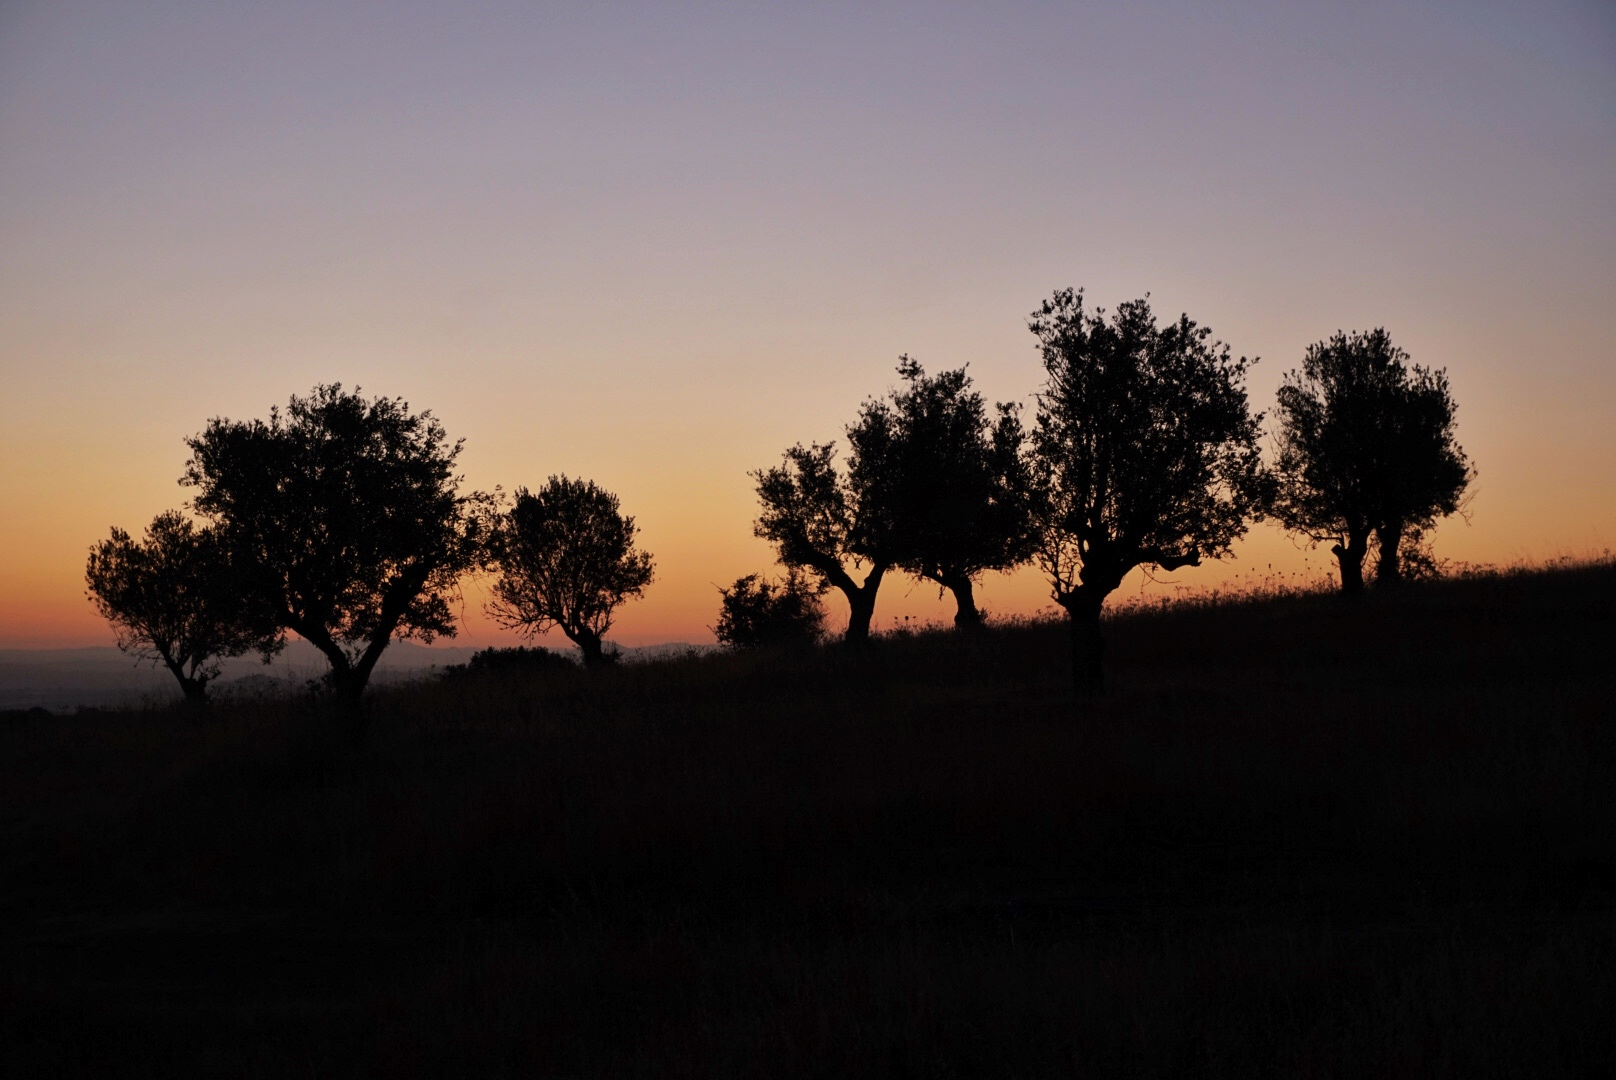 Sustainable Tourism - Portugal - Alentejo region